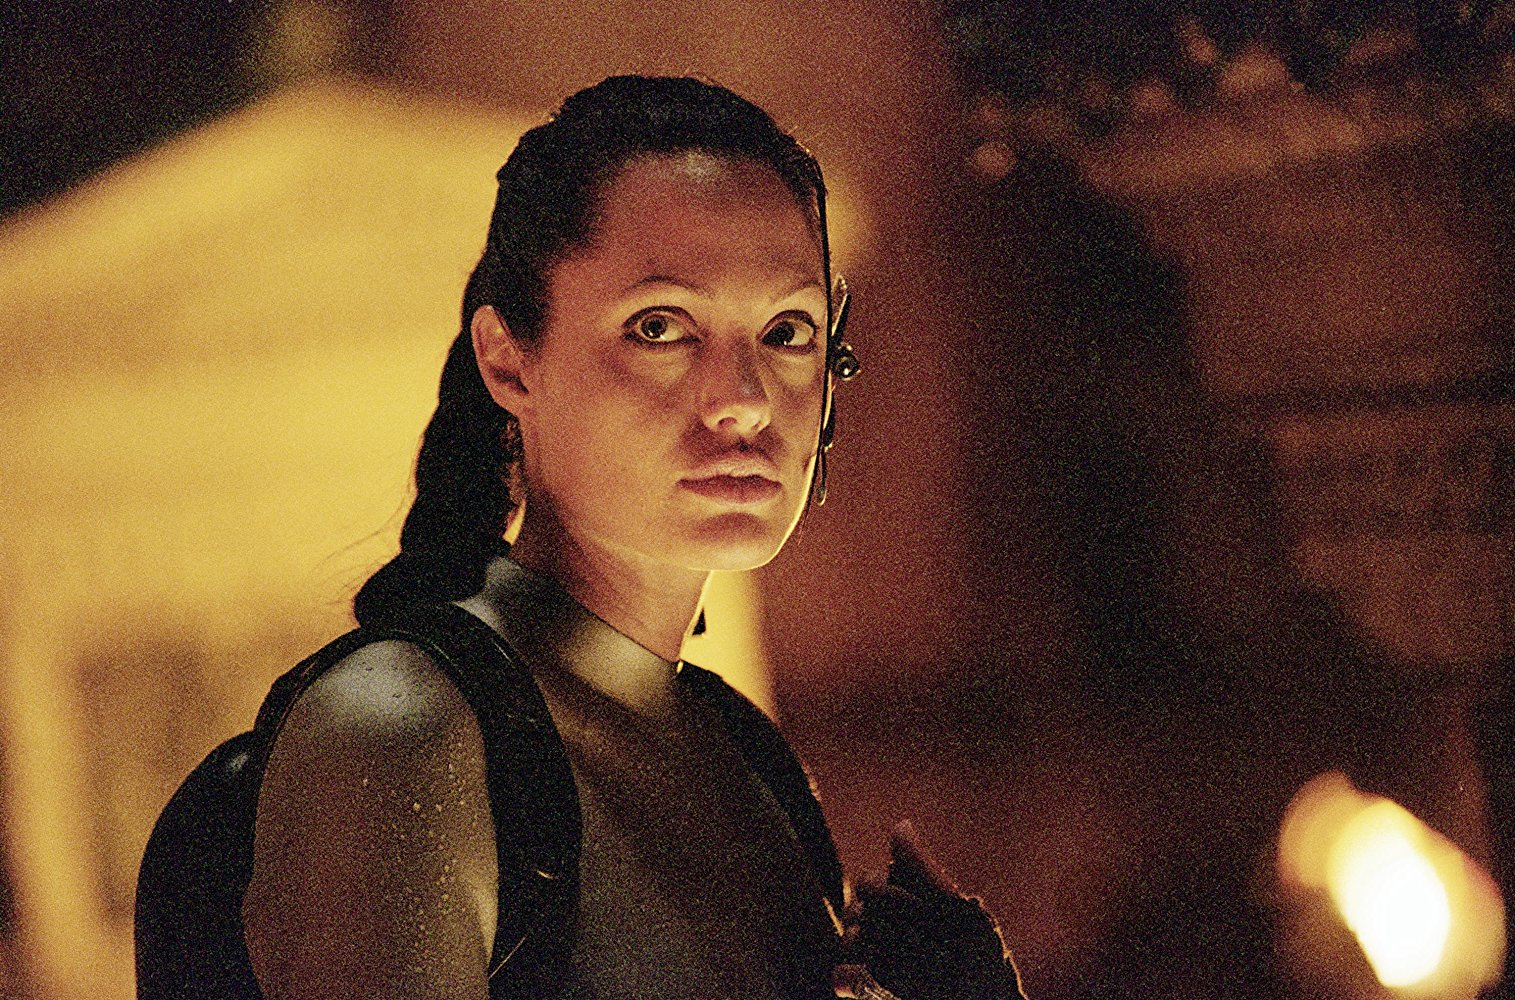 Angelina Jolie as Lara Croft in Lara Croft, Tomb Raider: The Cradle of Life (2003